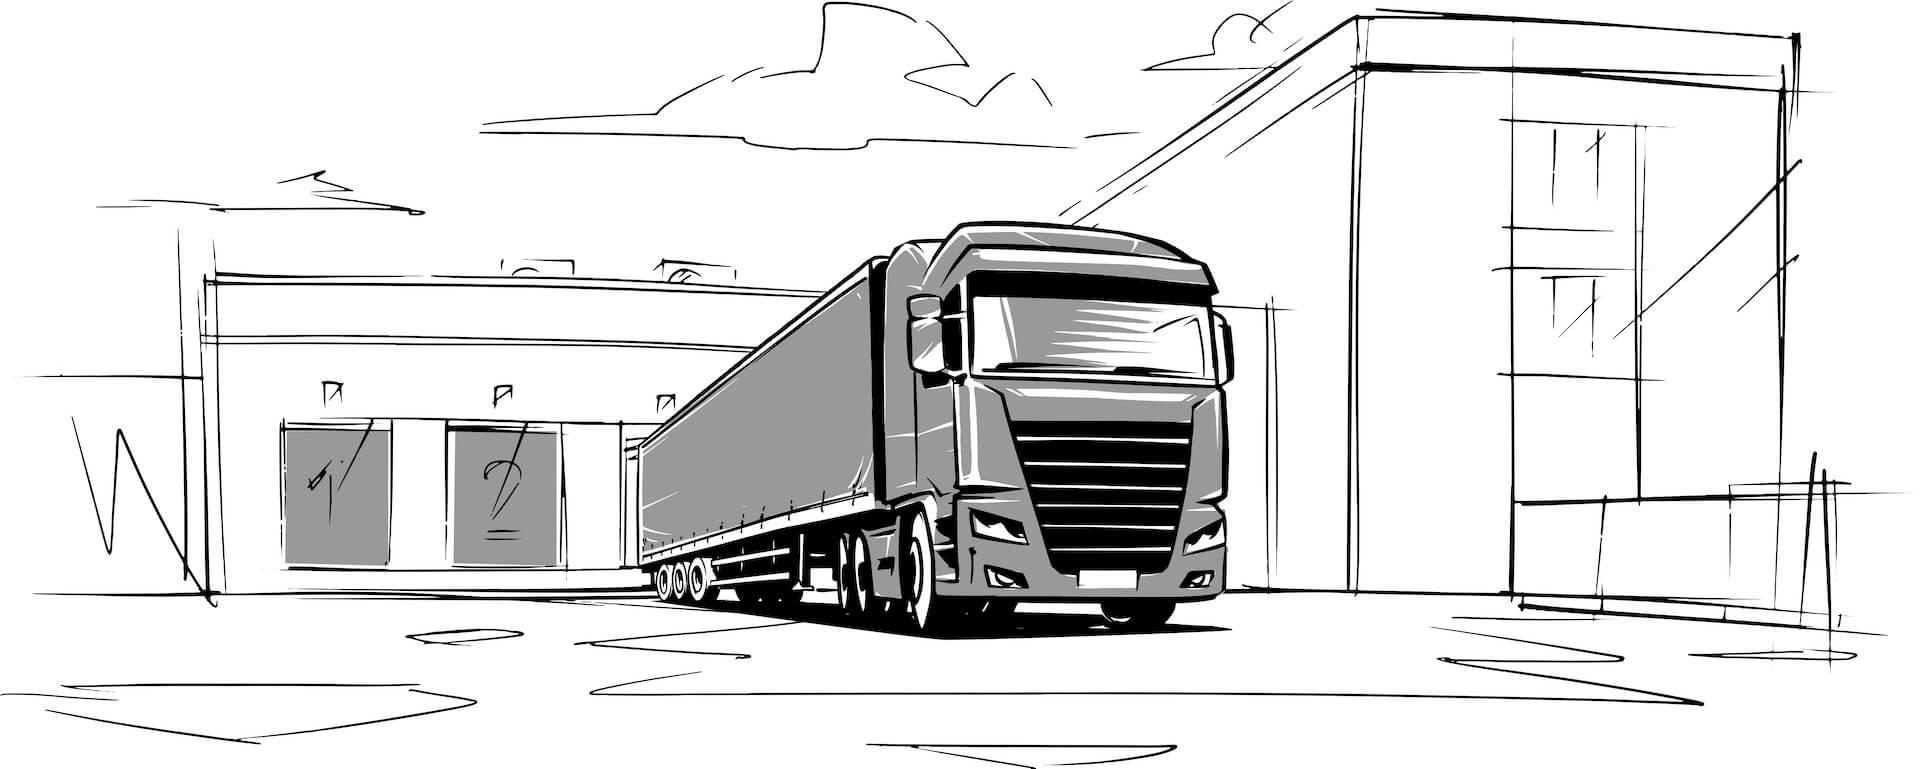 freightender logistics procurement software tender sourcing